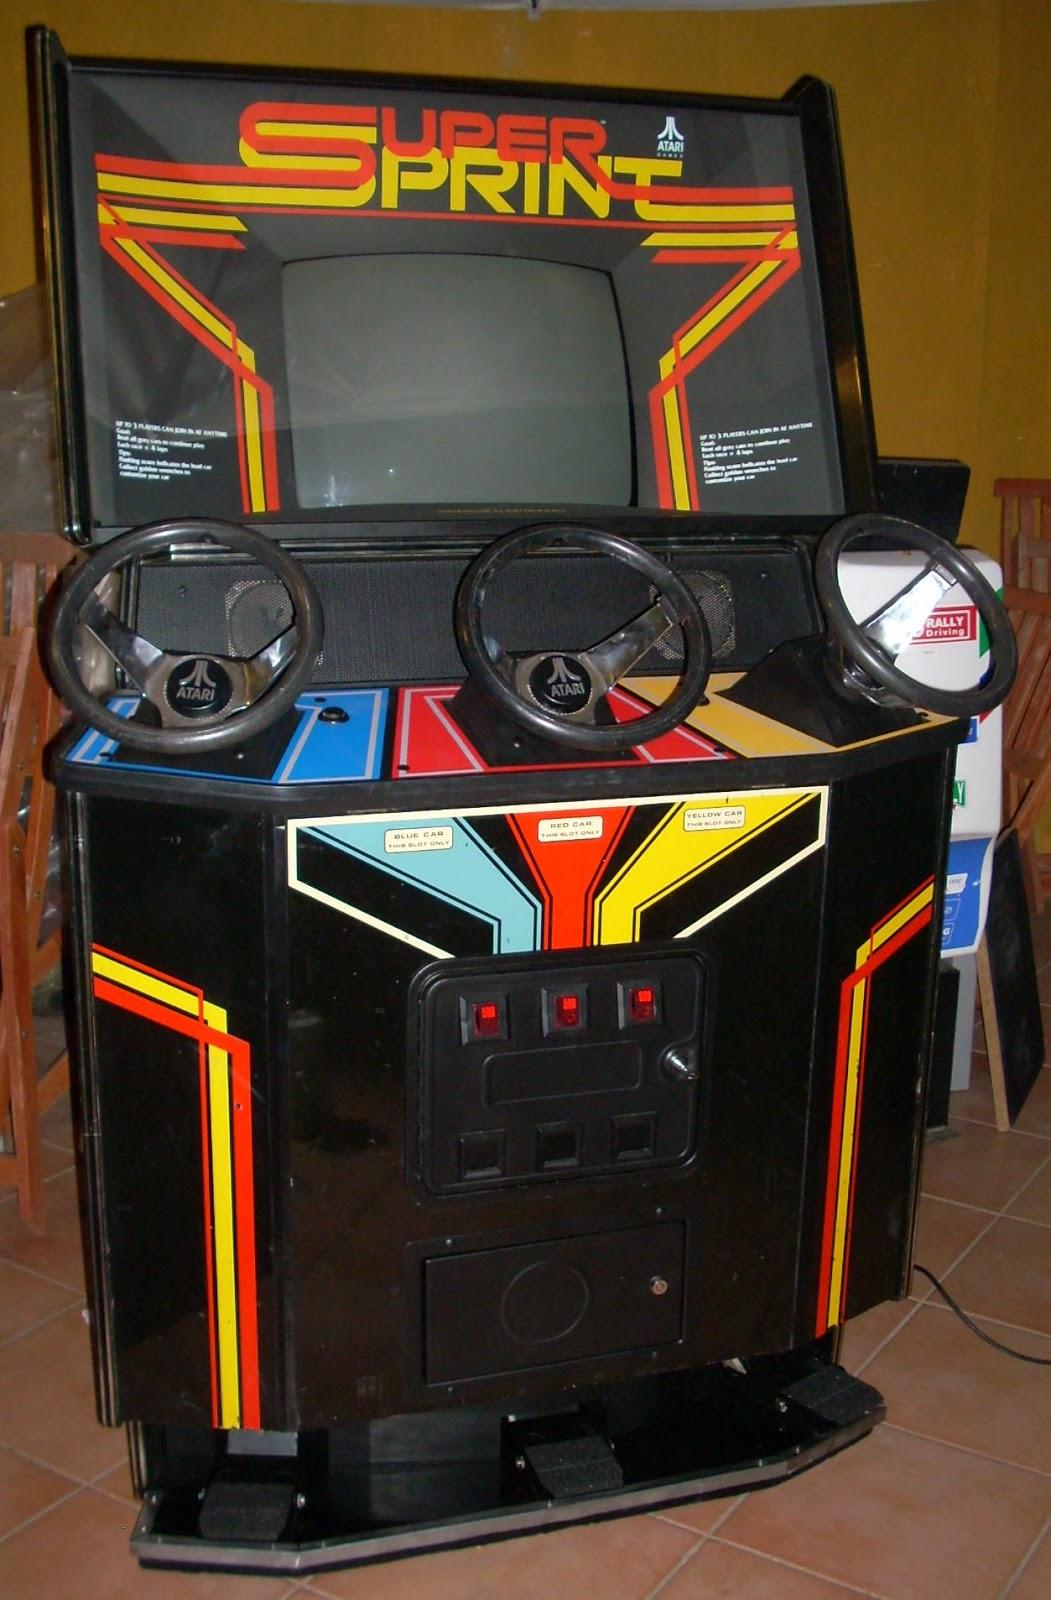 Super Sprint, Atari, Arcade Vintage